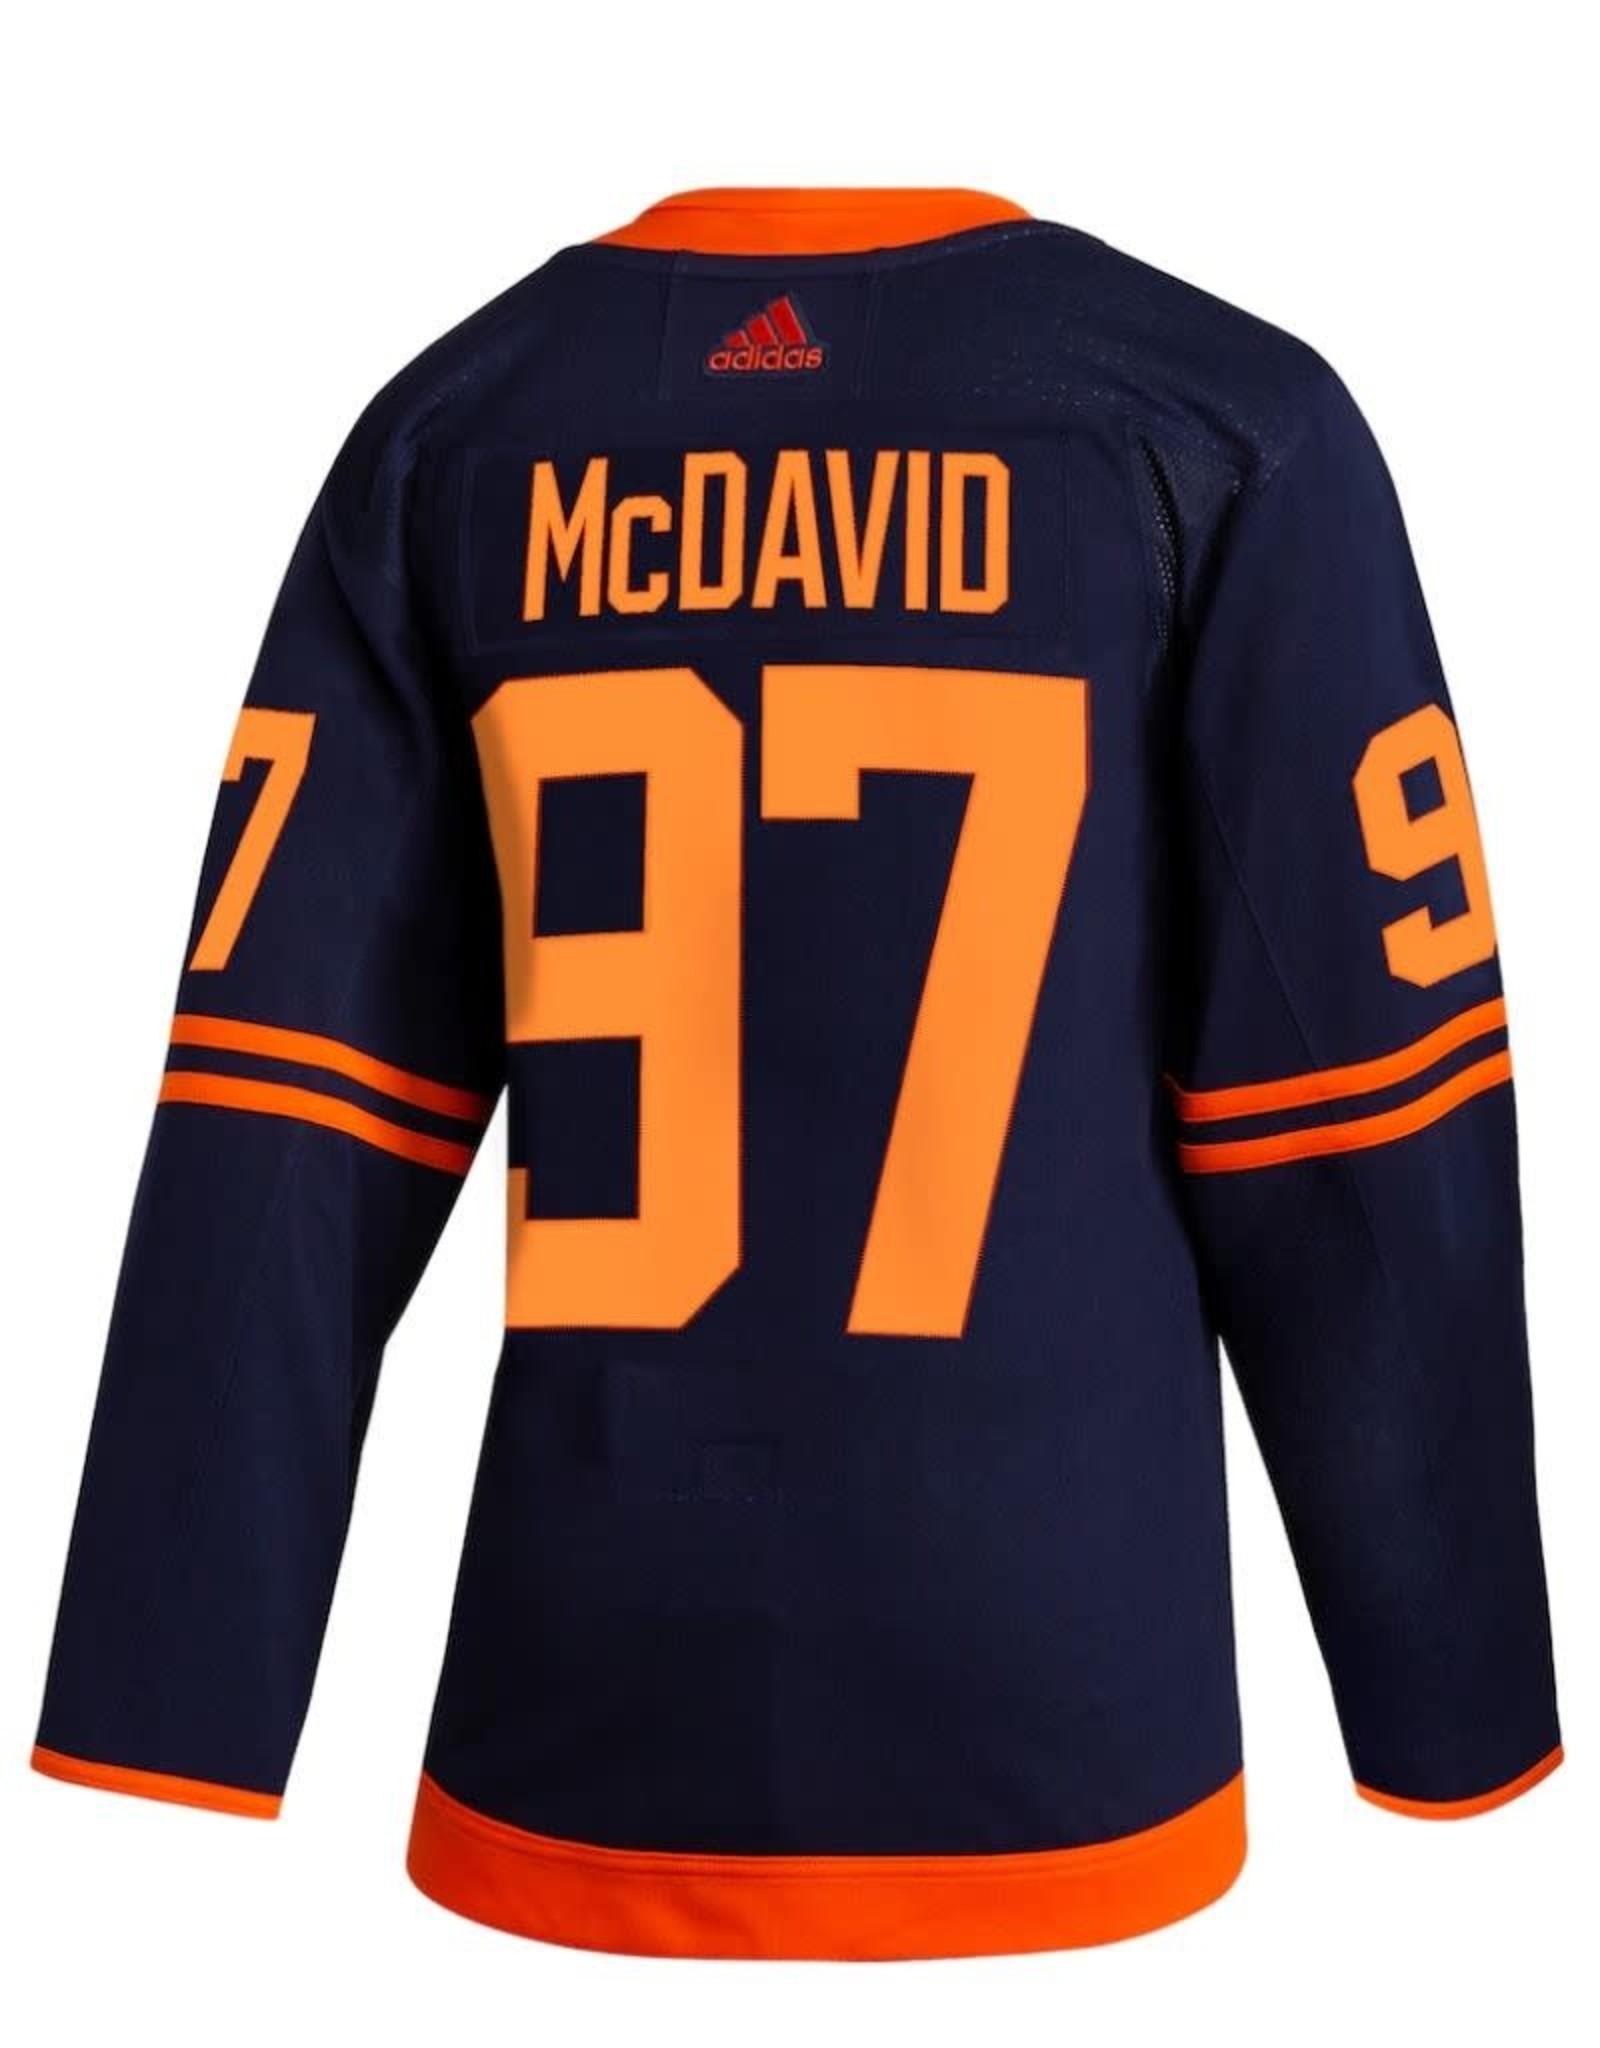 Adidas Adidas Men's Edmonton Oilers Navy Jersey McDavid #97